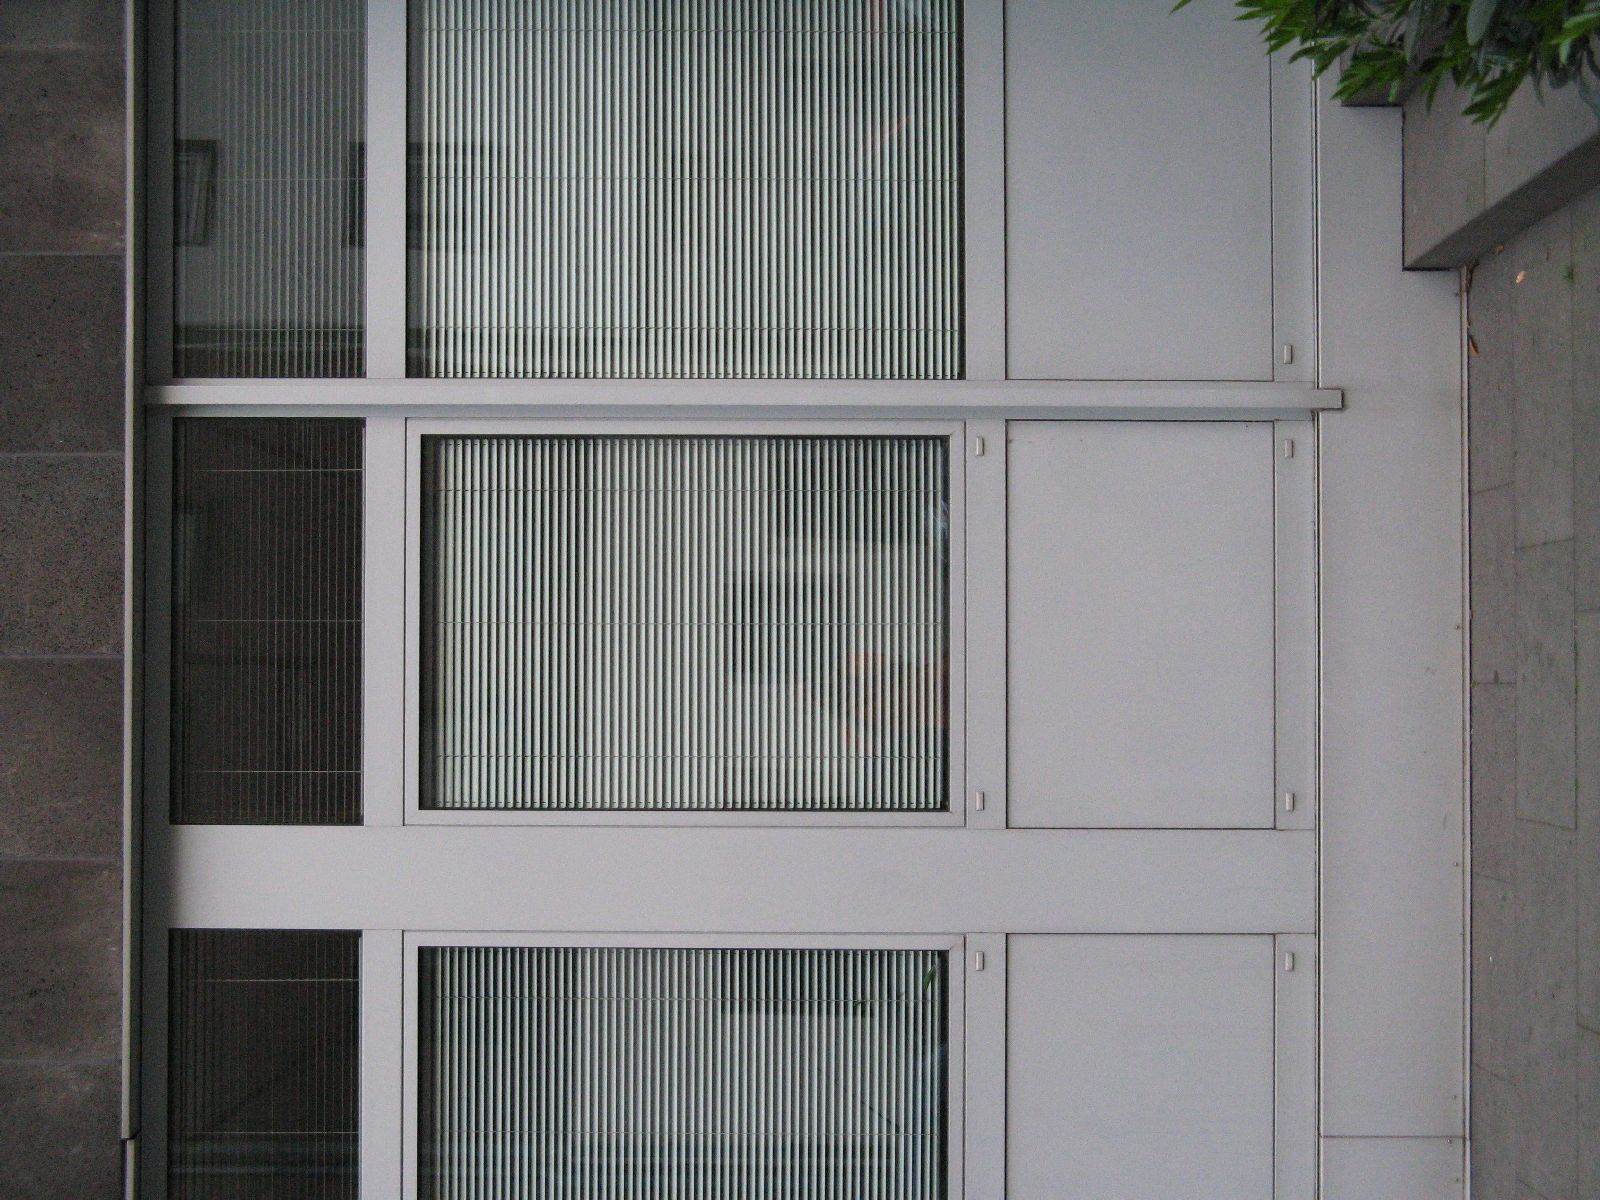 Building_Texture_B_0389